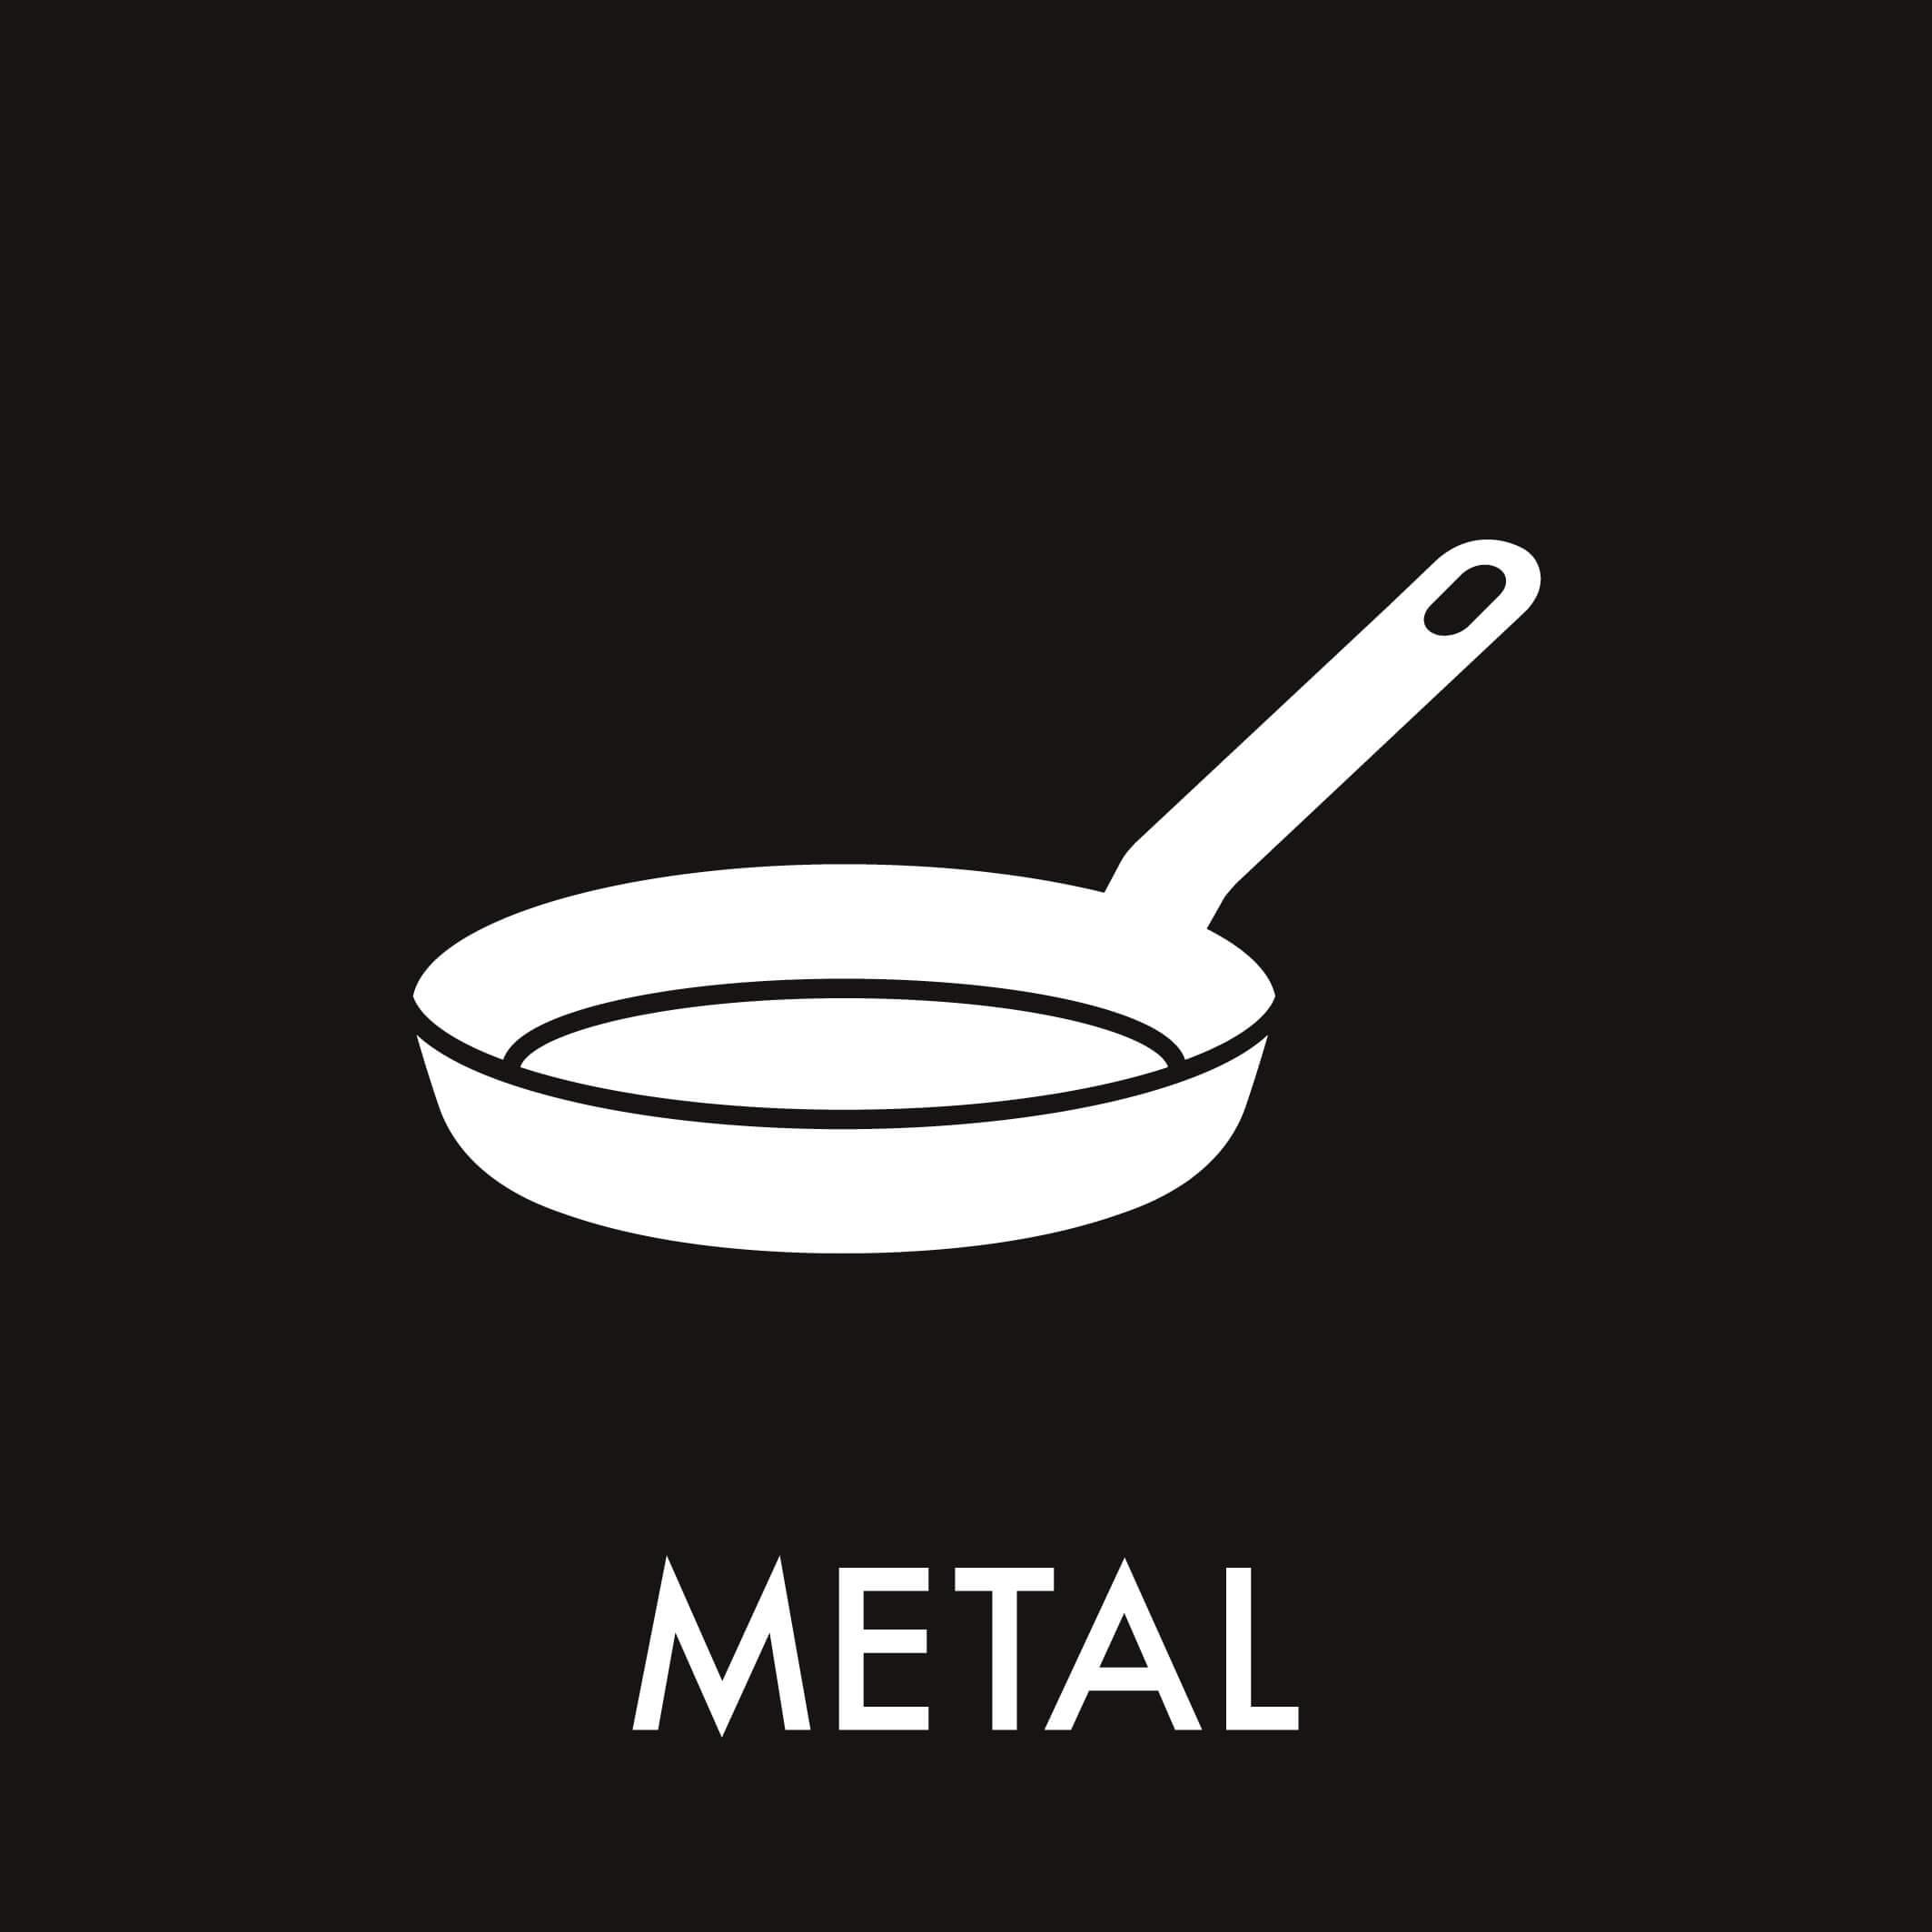 Dansk Affaldssortering - Metal sort